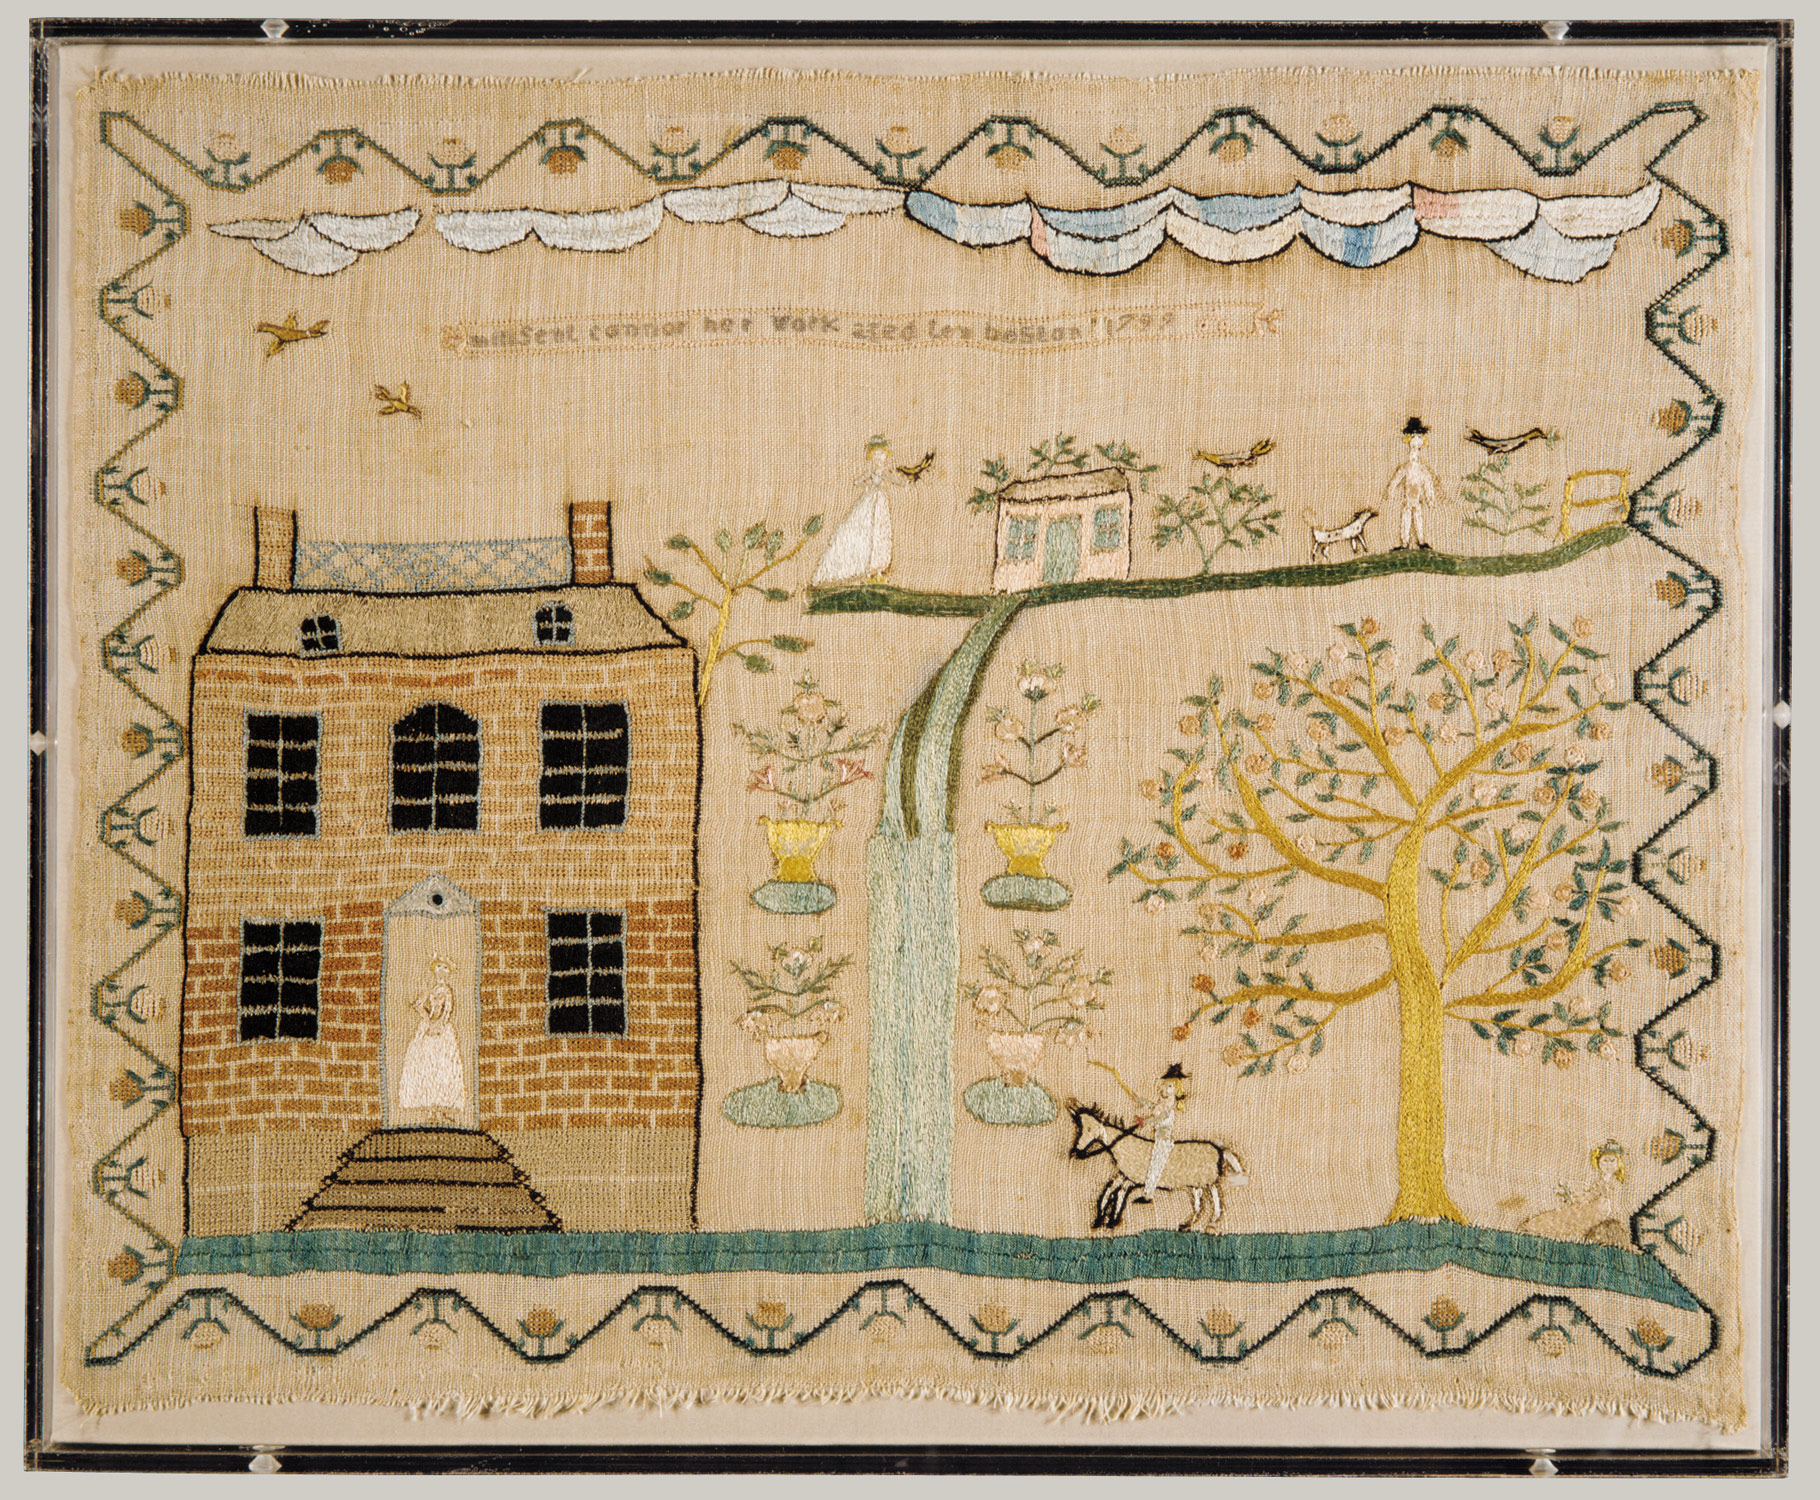 American Needlework In The Eighteenth Century Essay